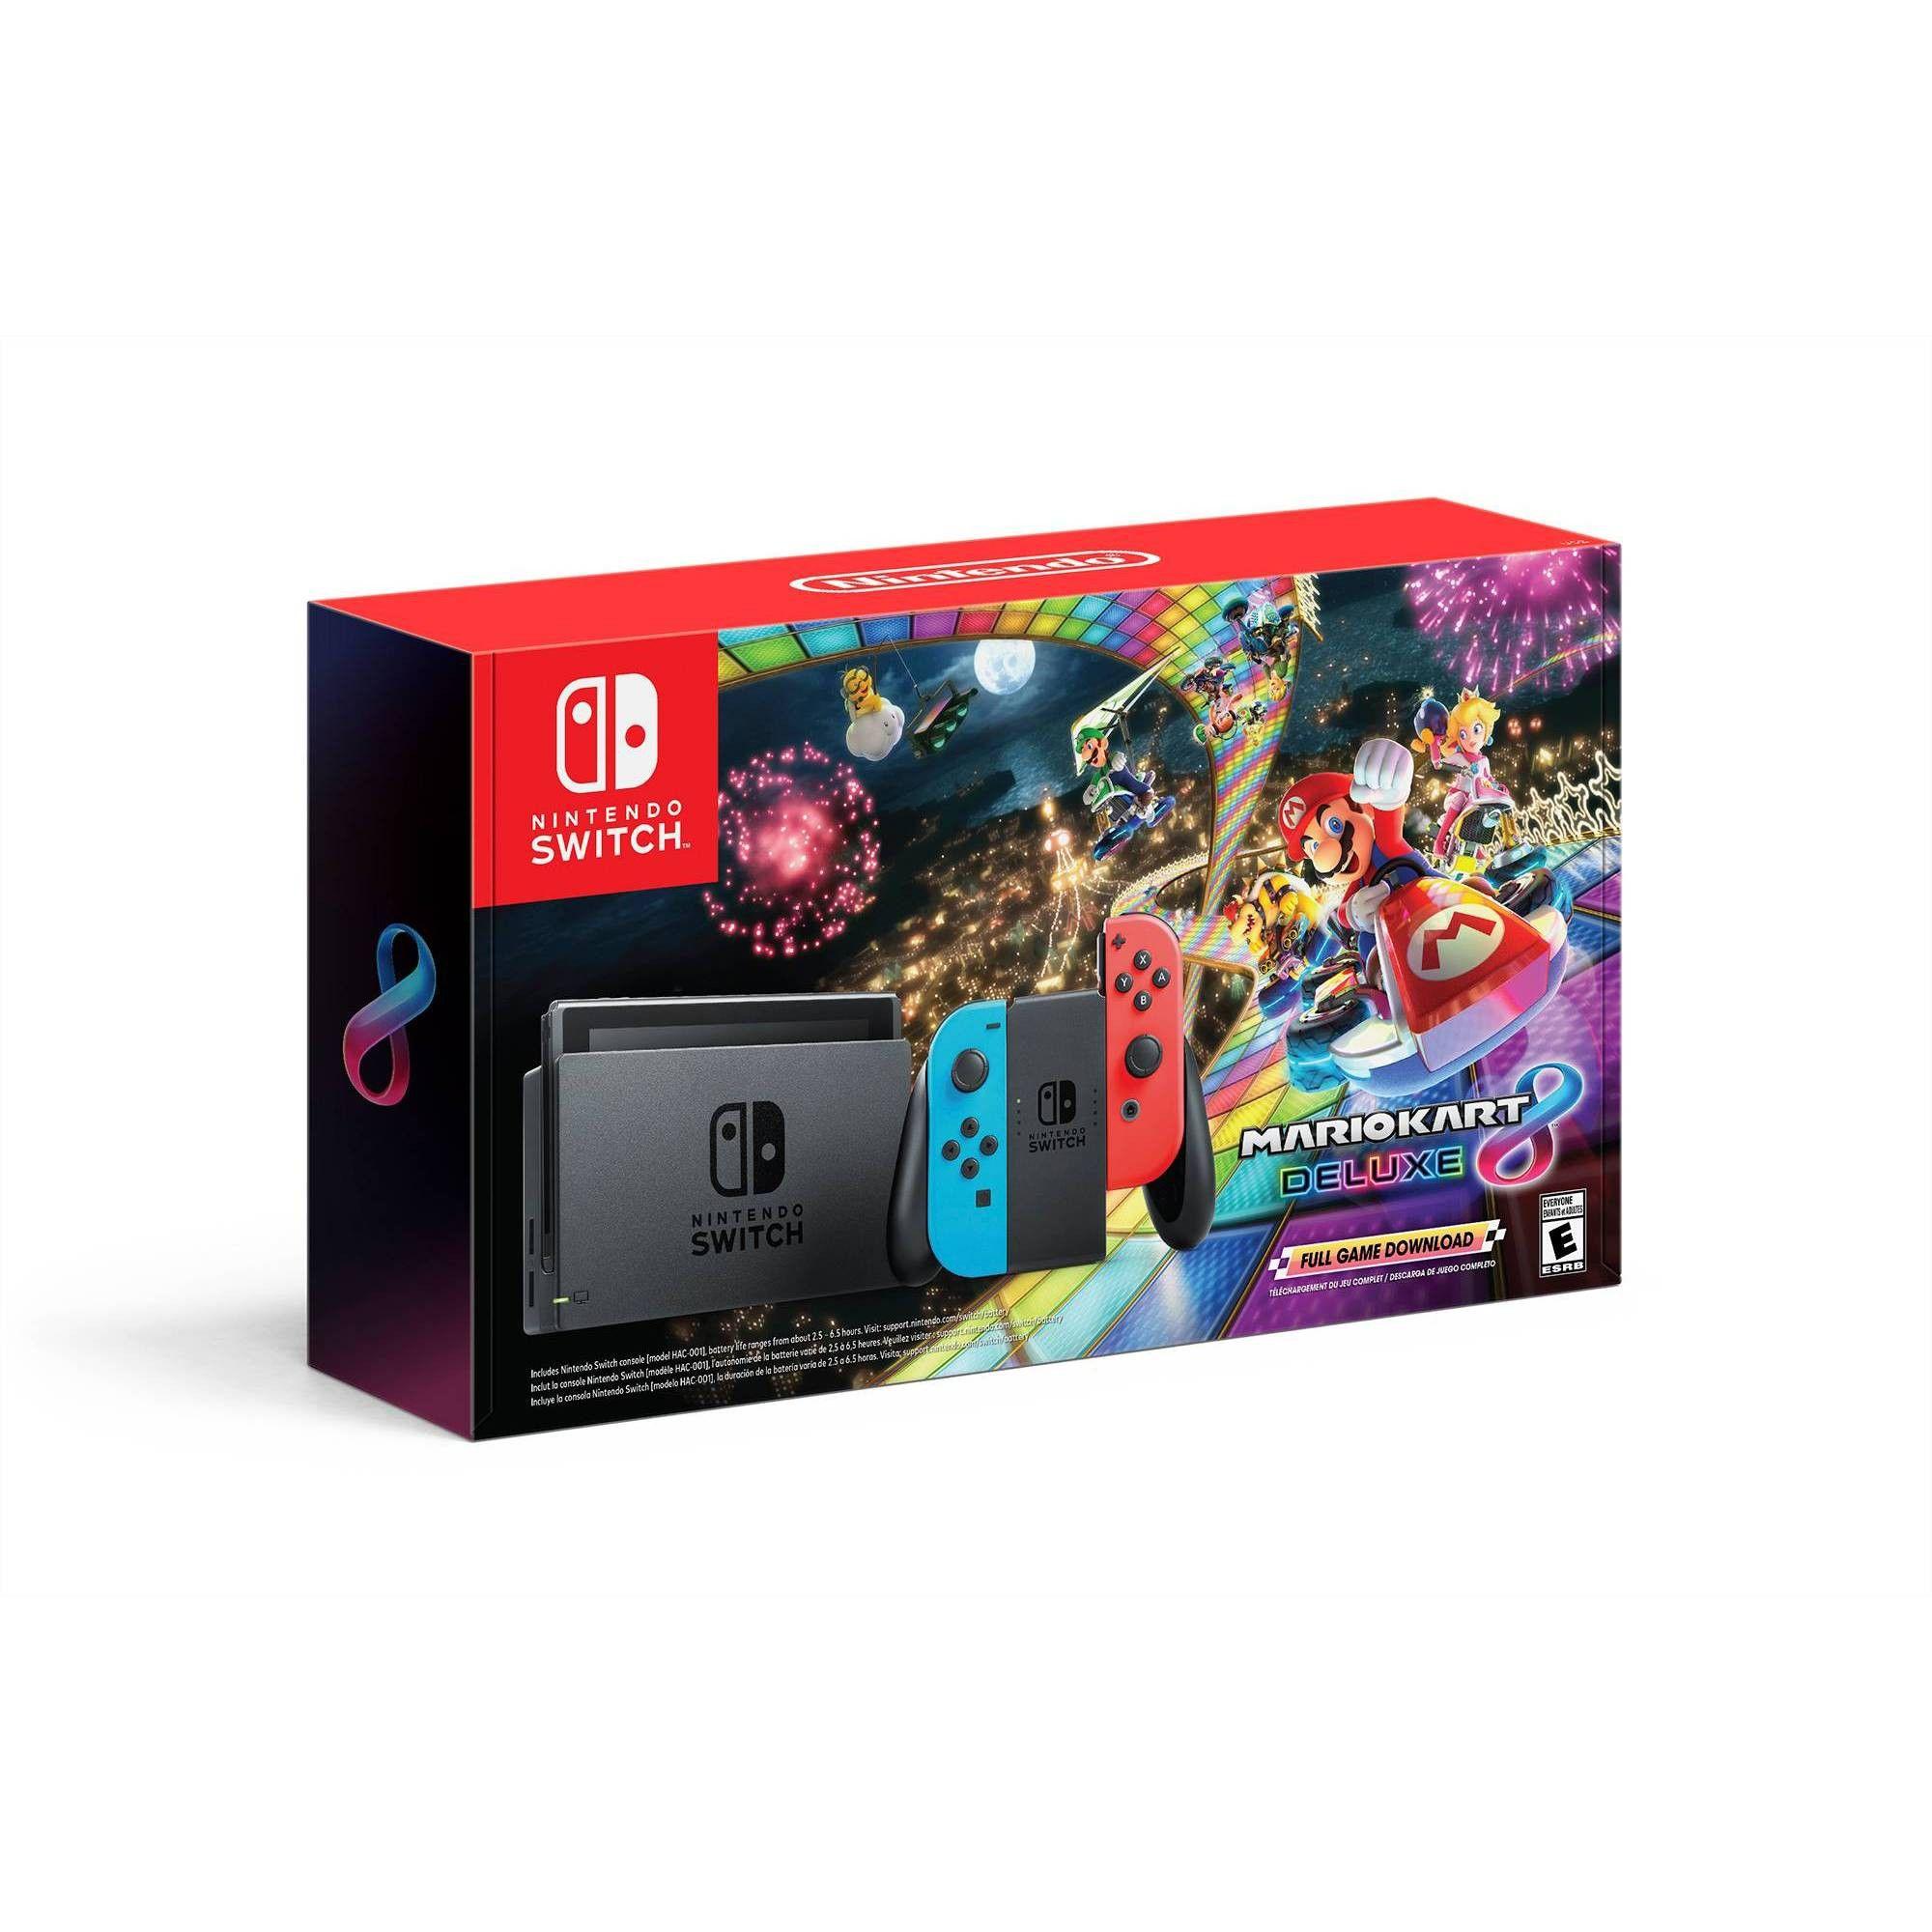 Nintendo Switch Mario Kart 8 Deluxe Bundle With Neon Blue And Neon Red Joy Con Nintendo Switch Nintendo Mario Kart